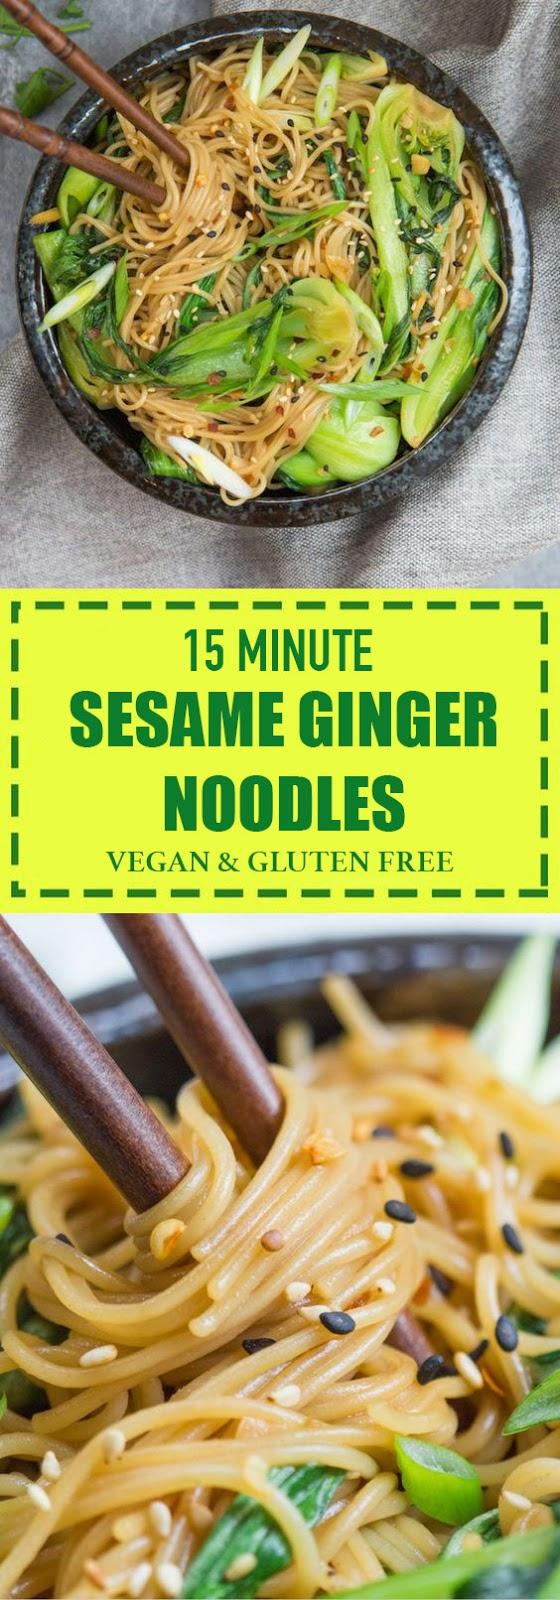 Ready in 15 Minute Sesame Ginger Noodles Vegan & Gluten Free